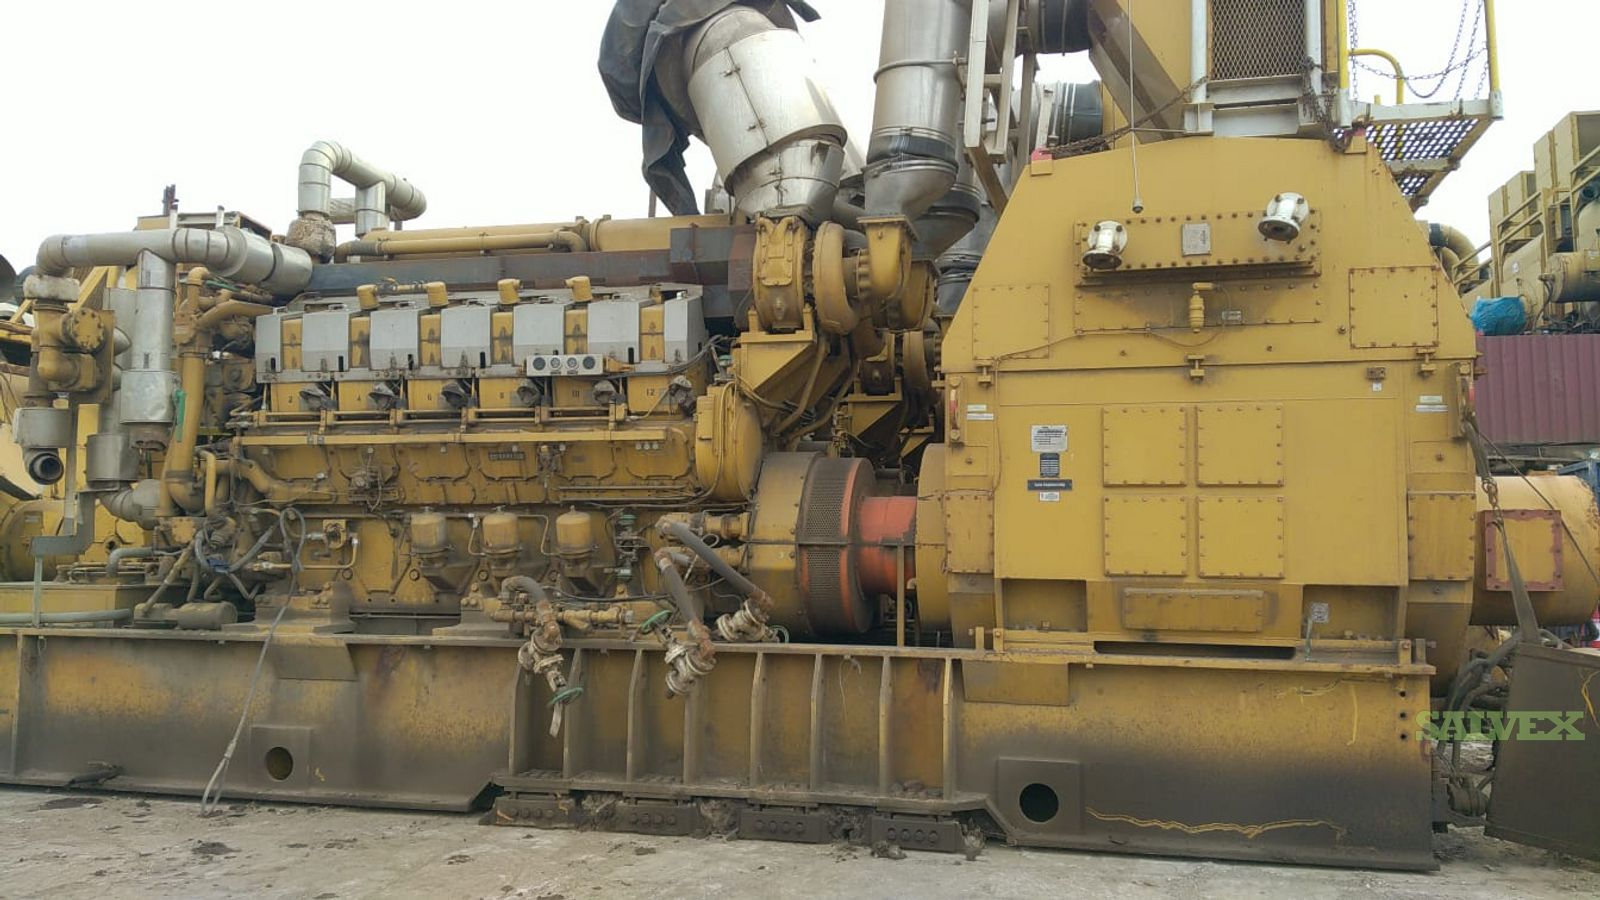 CAT Marine Generator with Alternator 3612 (6 Units)